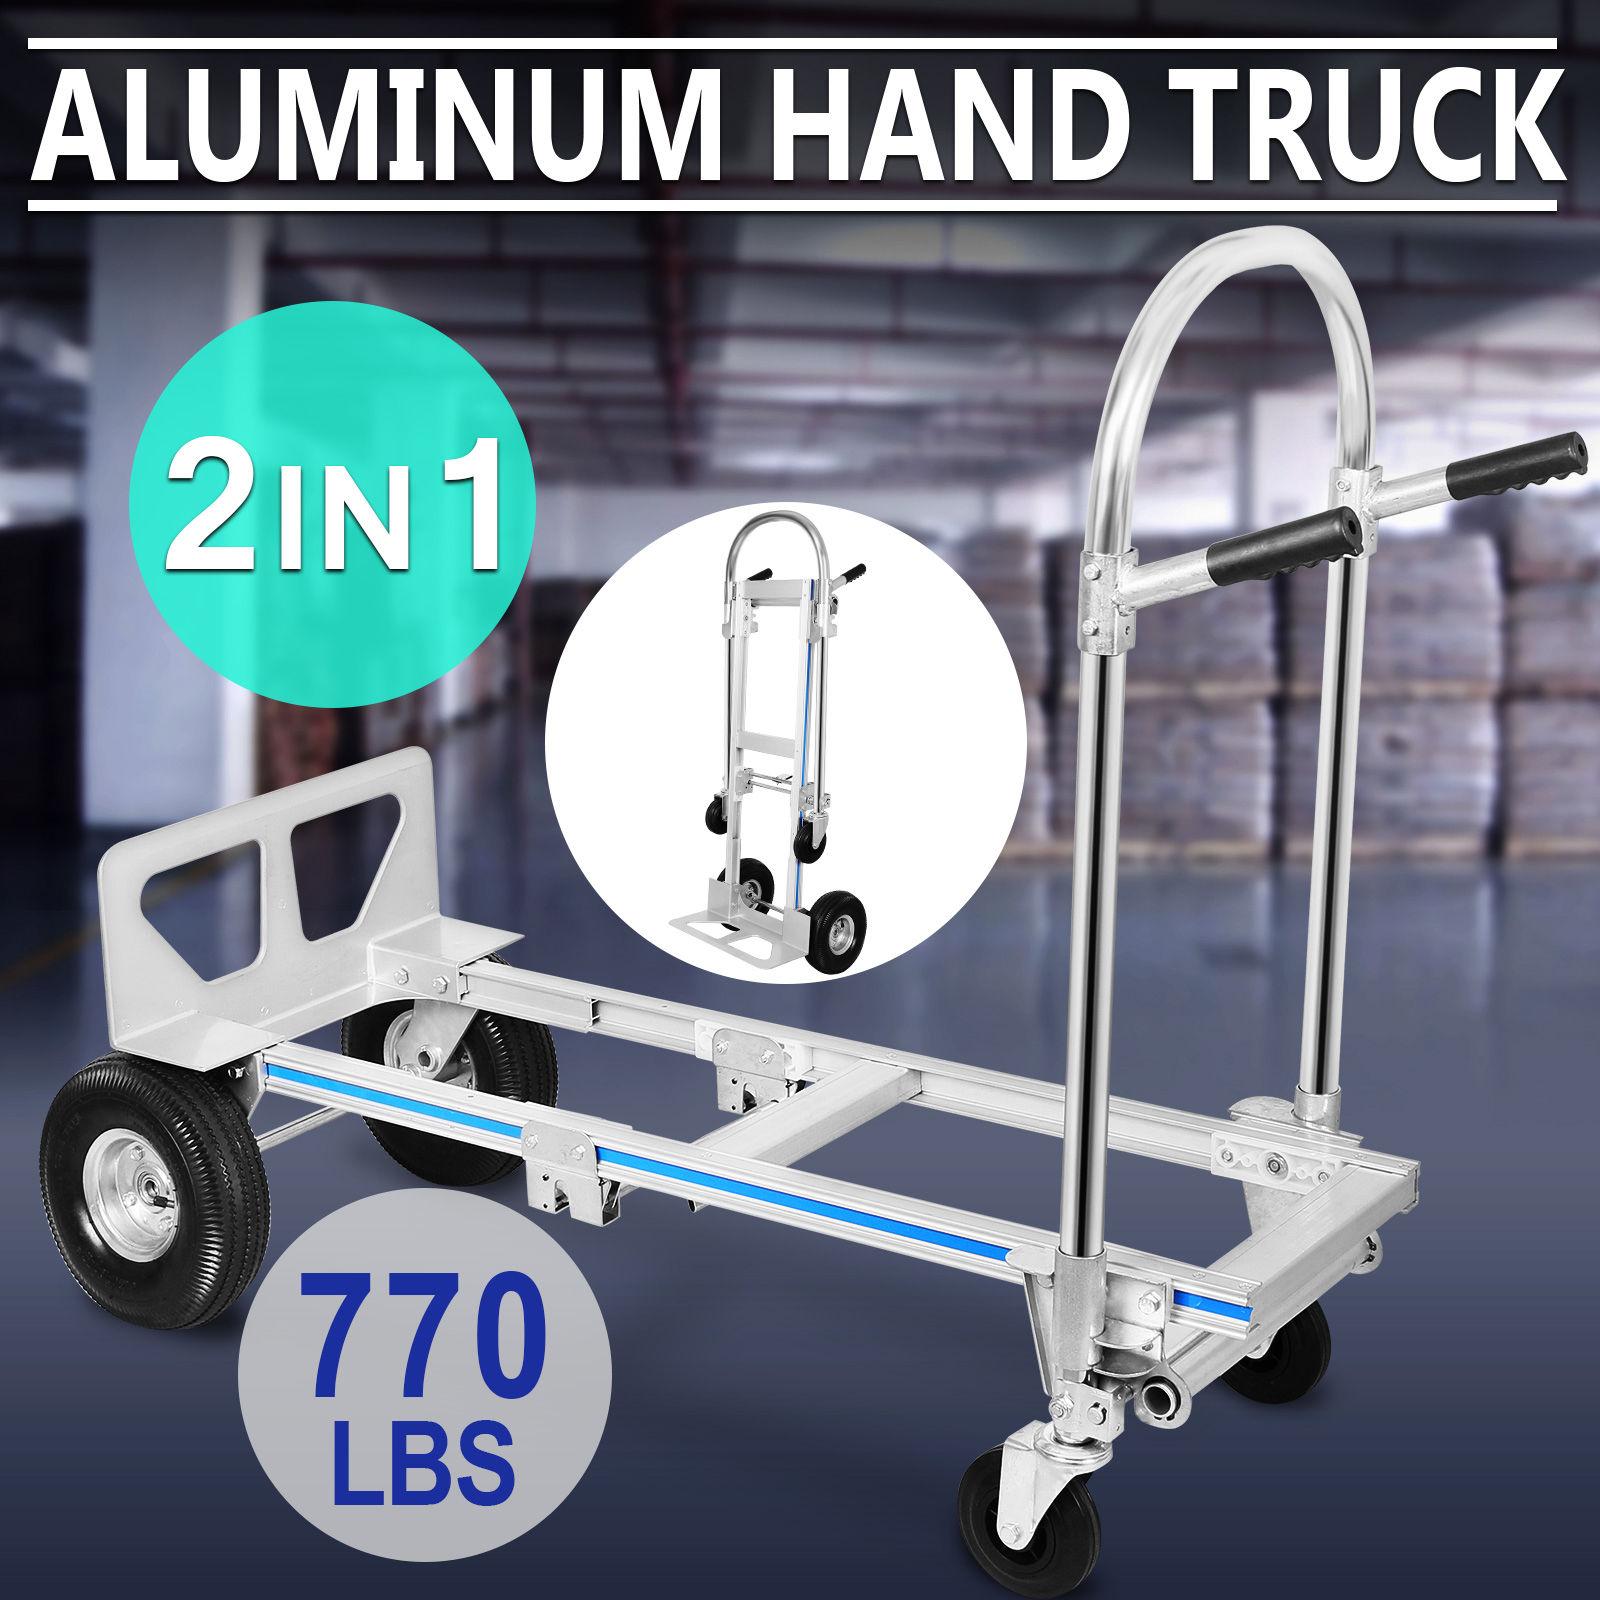 2in1 Hand Truck Convertible Folding Dolly Garden 4-Wheels Barrow Transport Trolley Carretilla Luggage Shopping Travel Cart 770LB